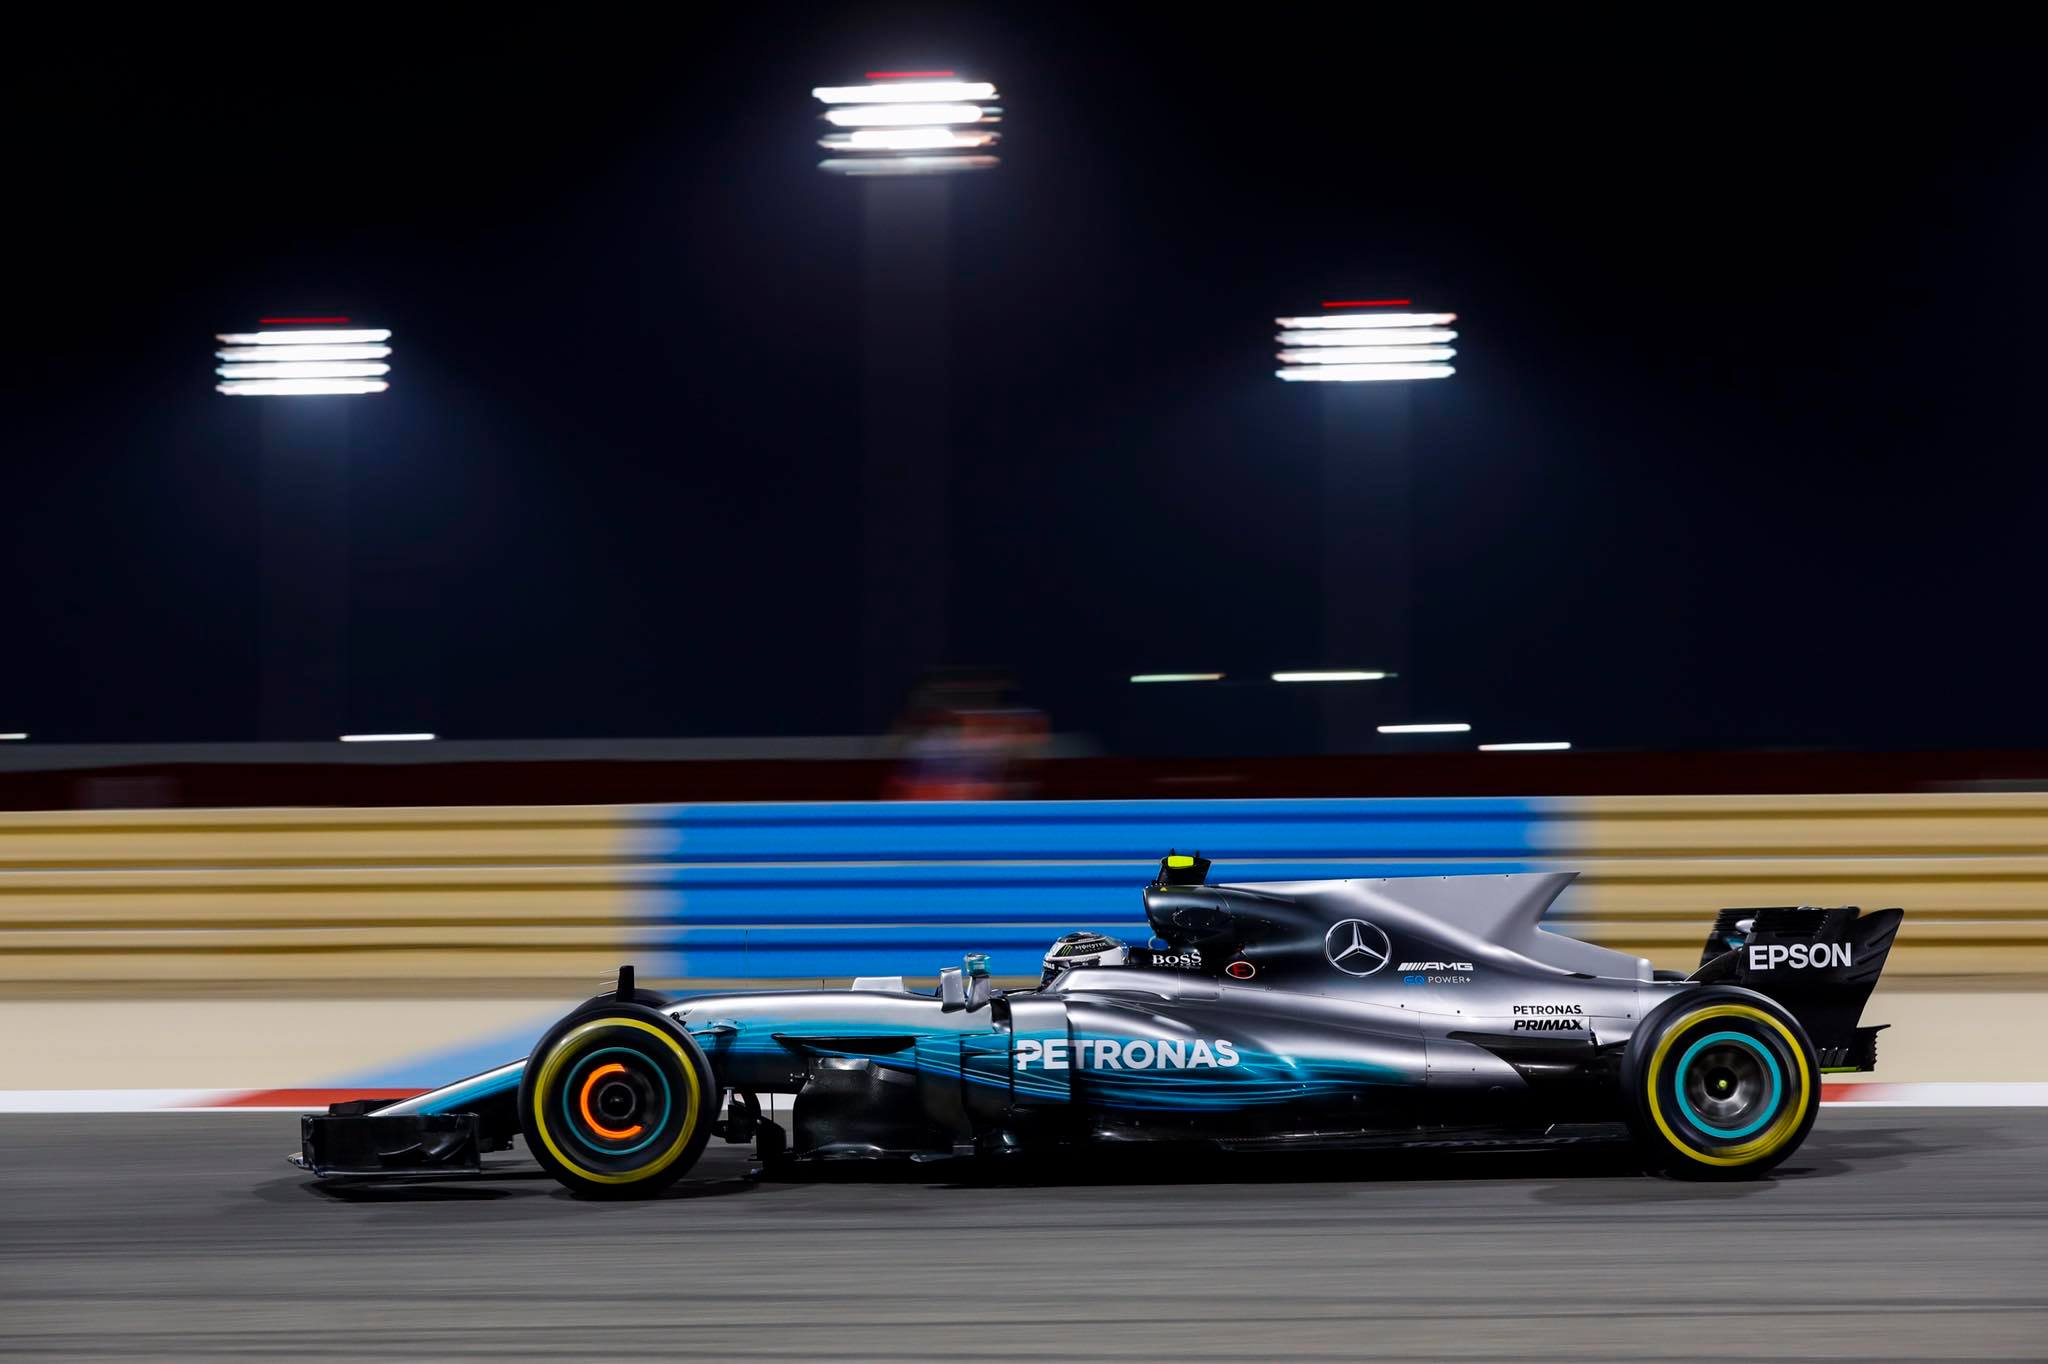 Mercedes F1 Bahrein 2017 Les Voitures